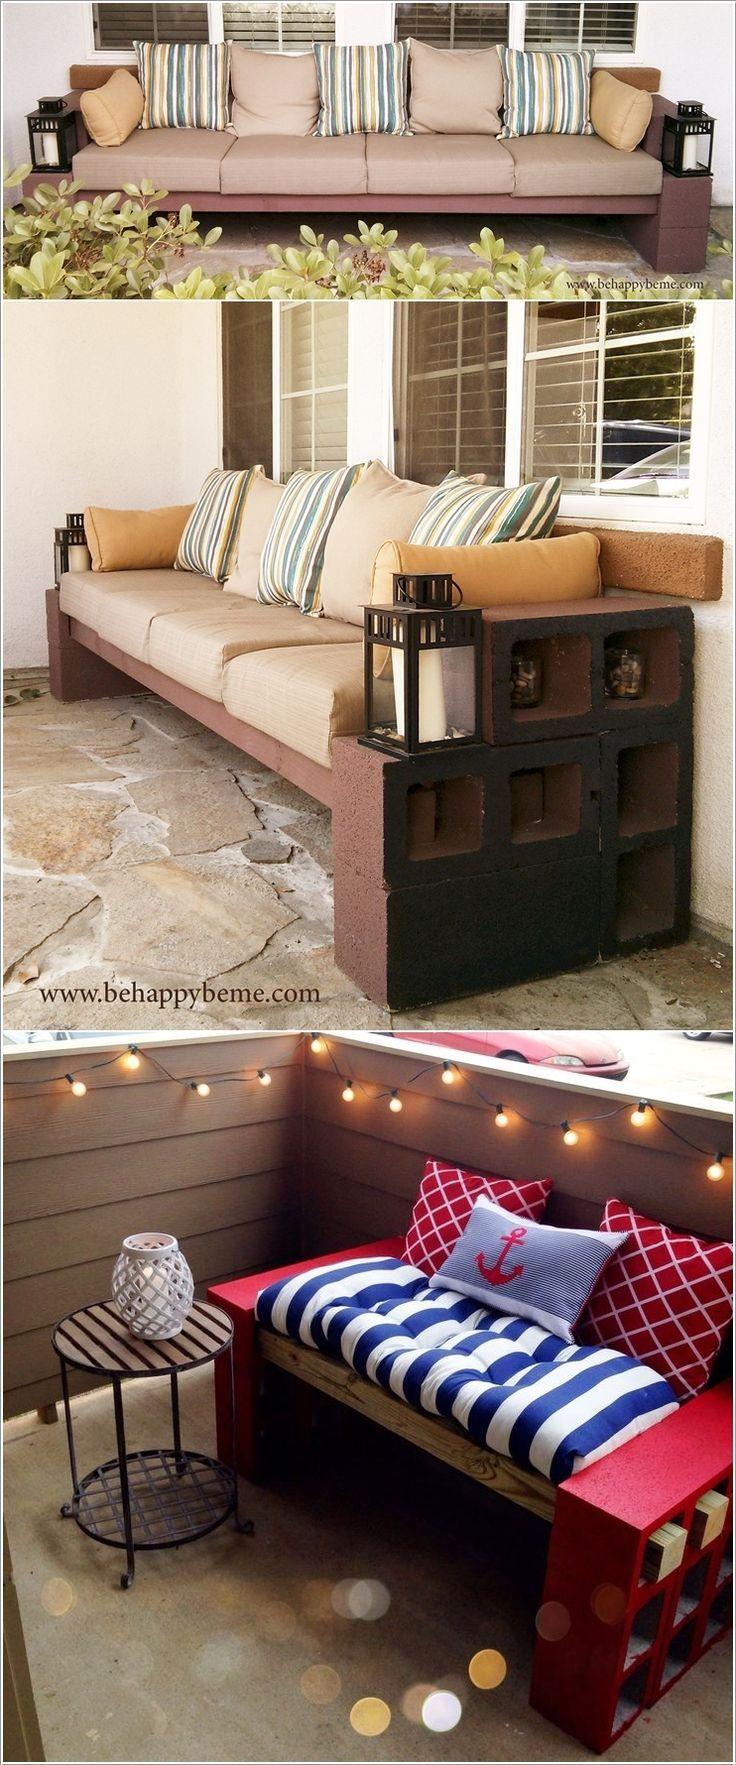 10 Wonderful And Cheap DIY Idea For Your Garden 7